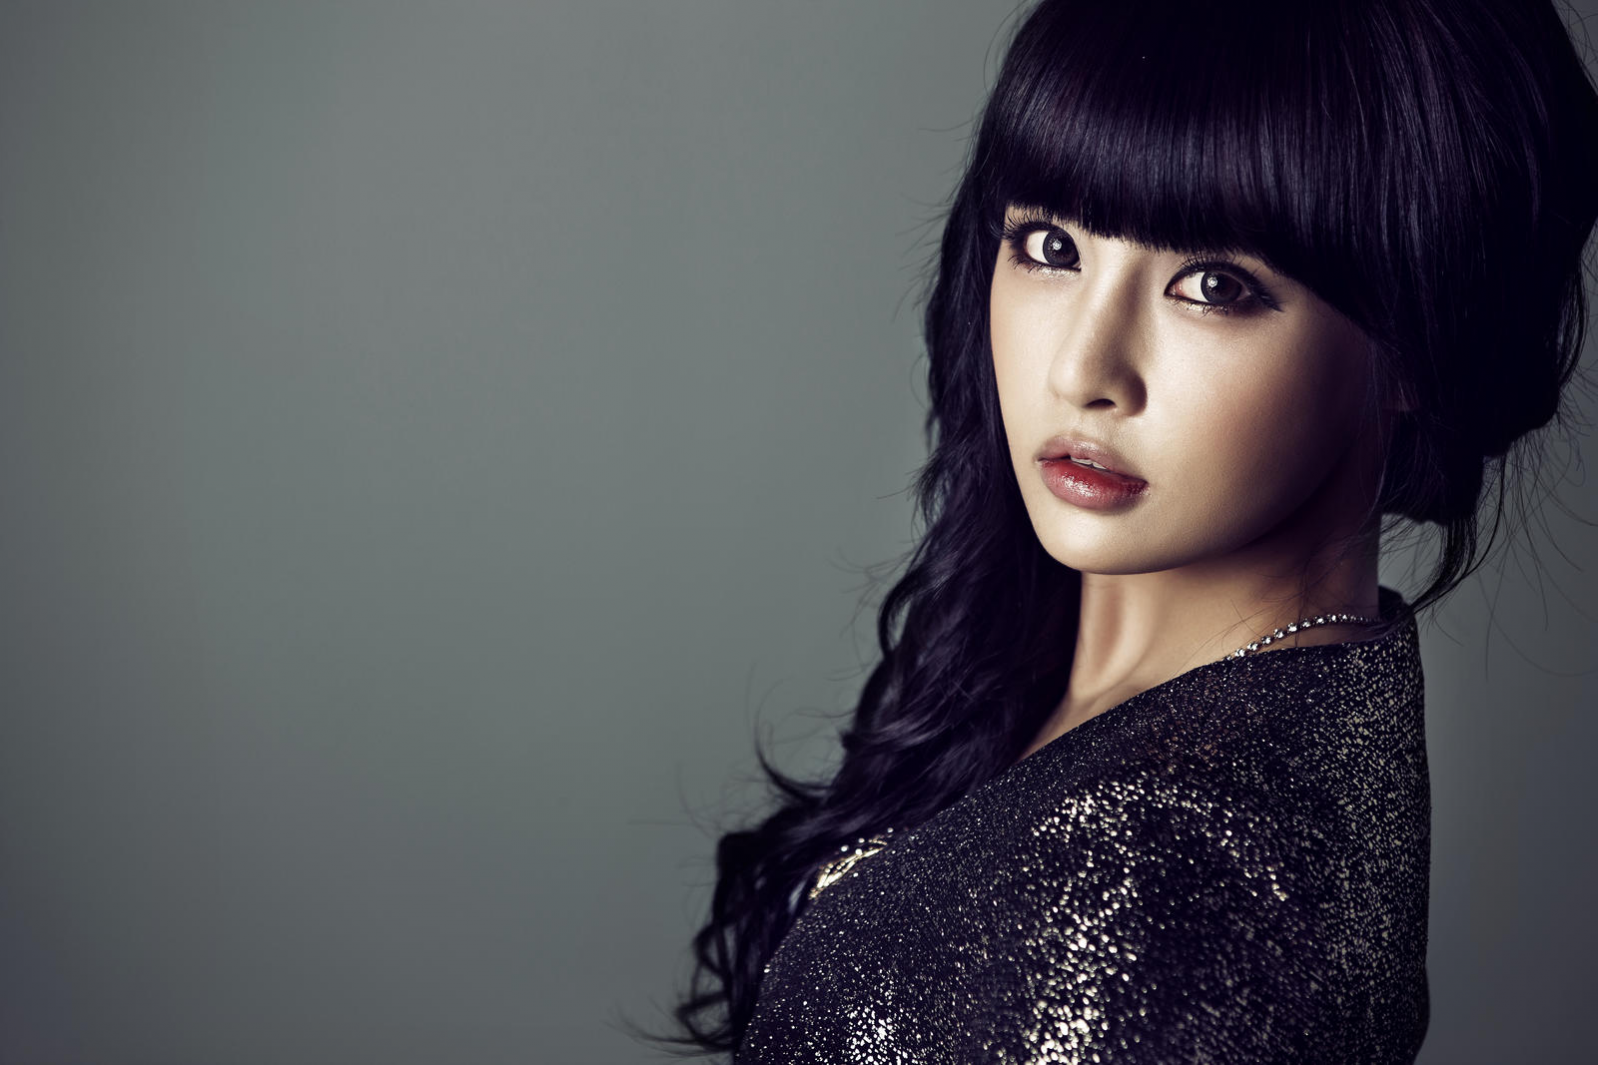 T-ara Member Boram's Gaunt Legs Draw Concern from Netizens